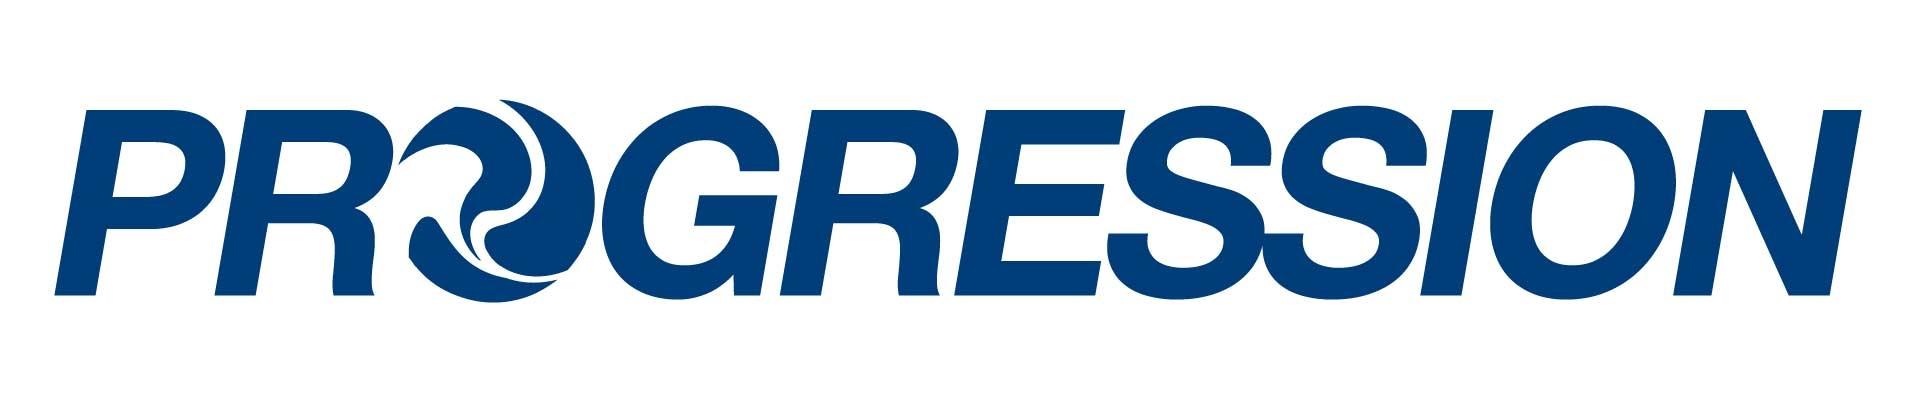 progression-logo.jpg